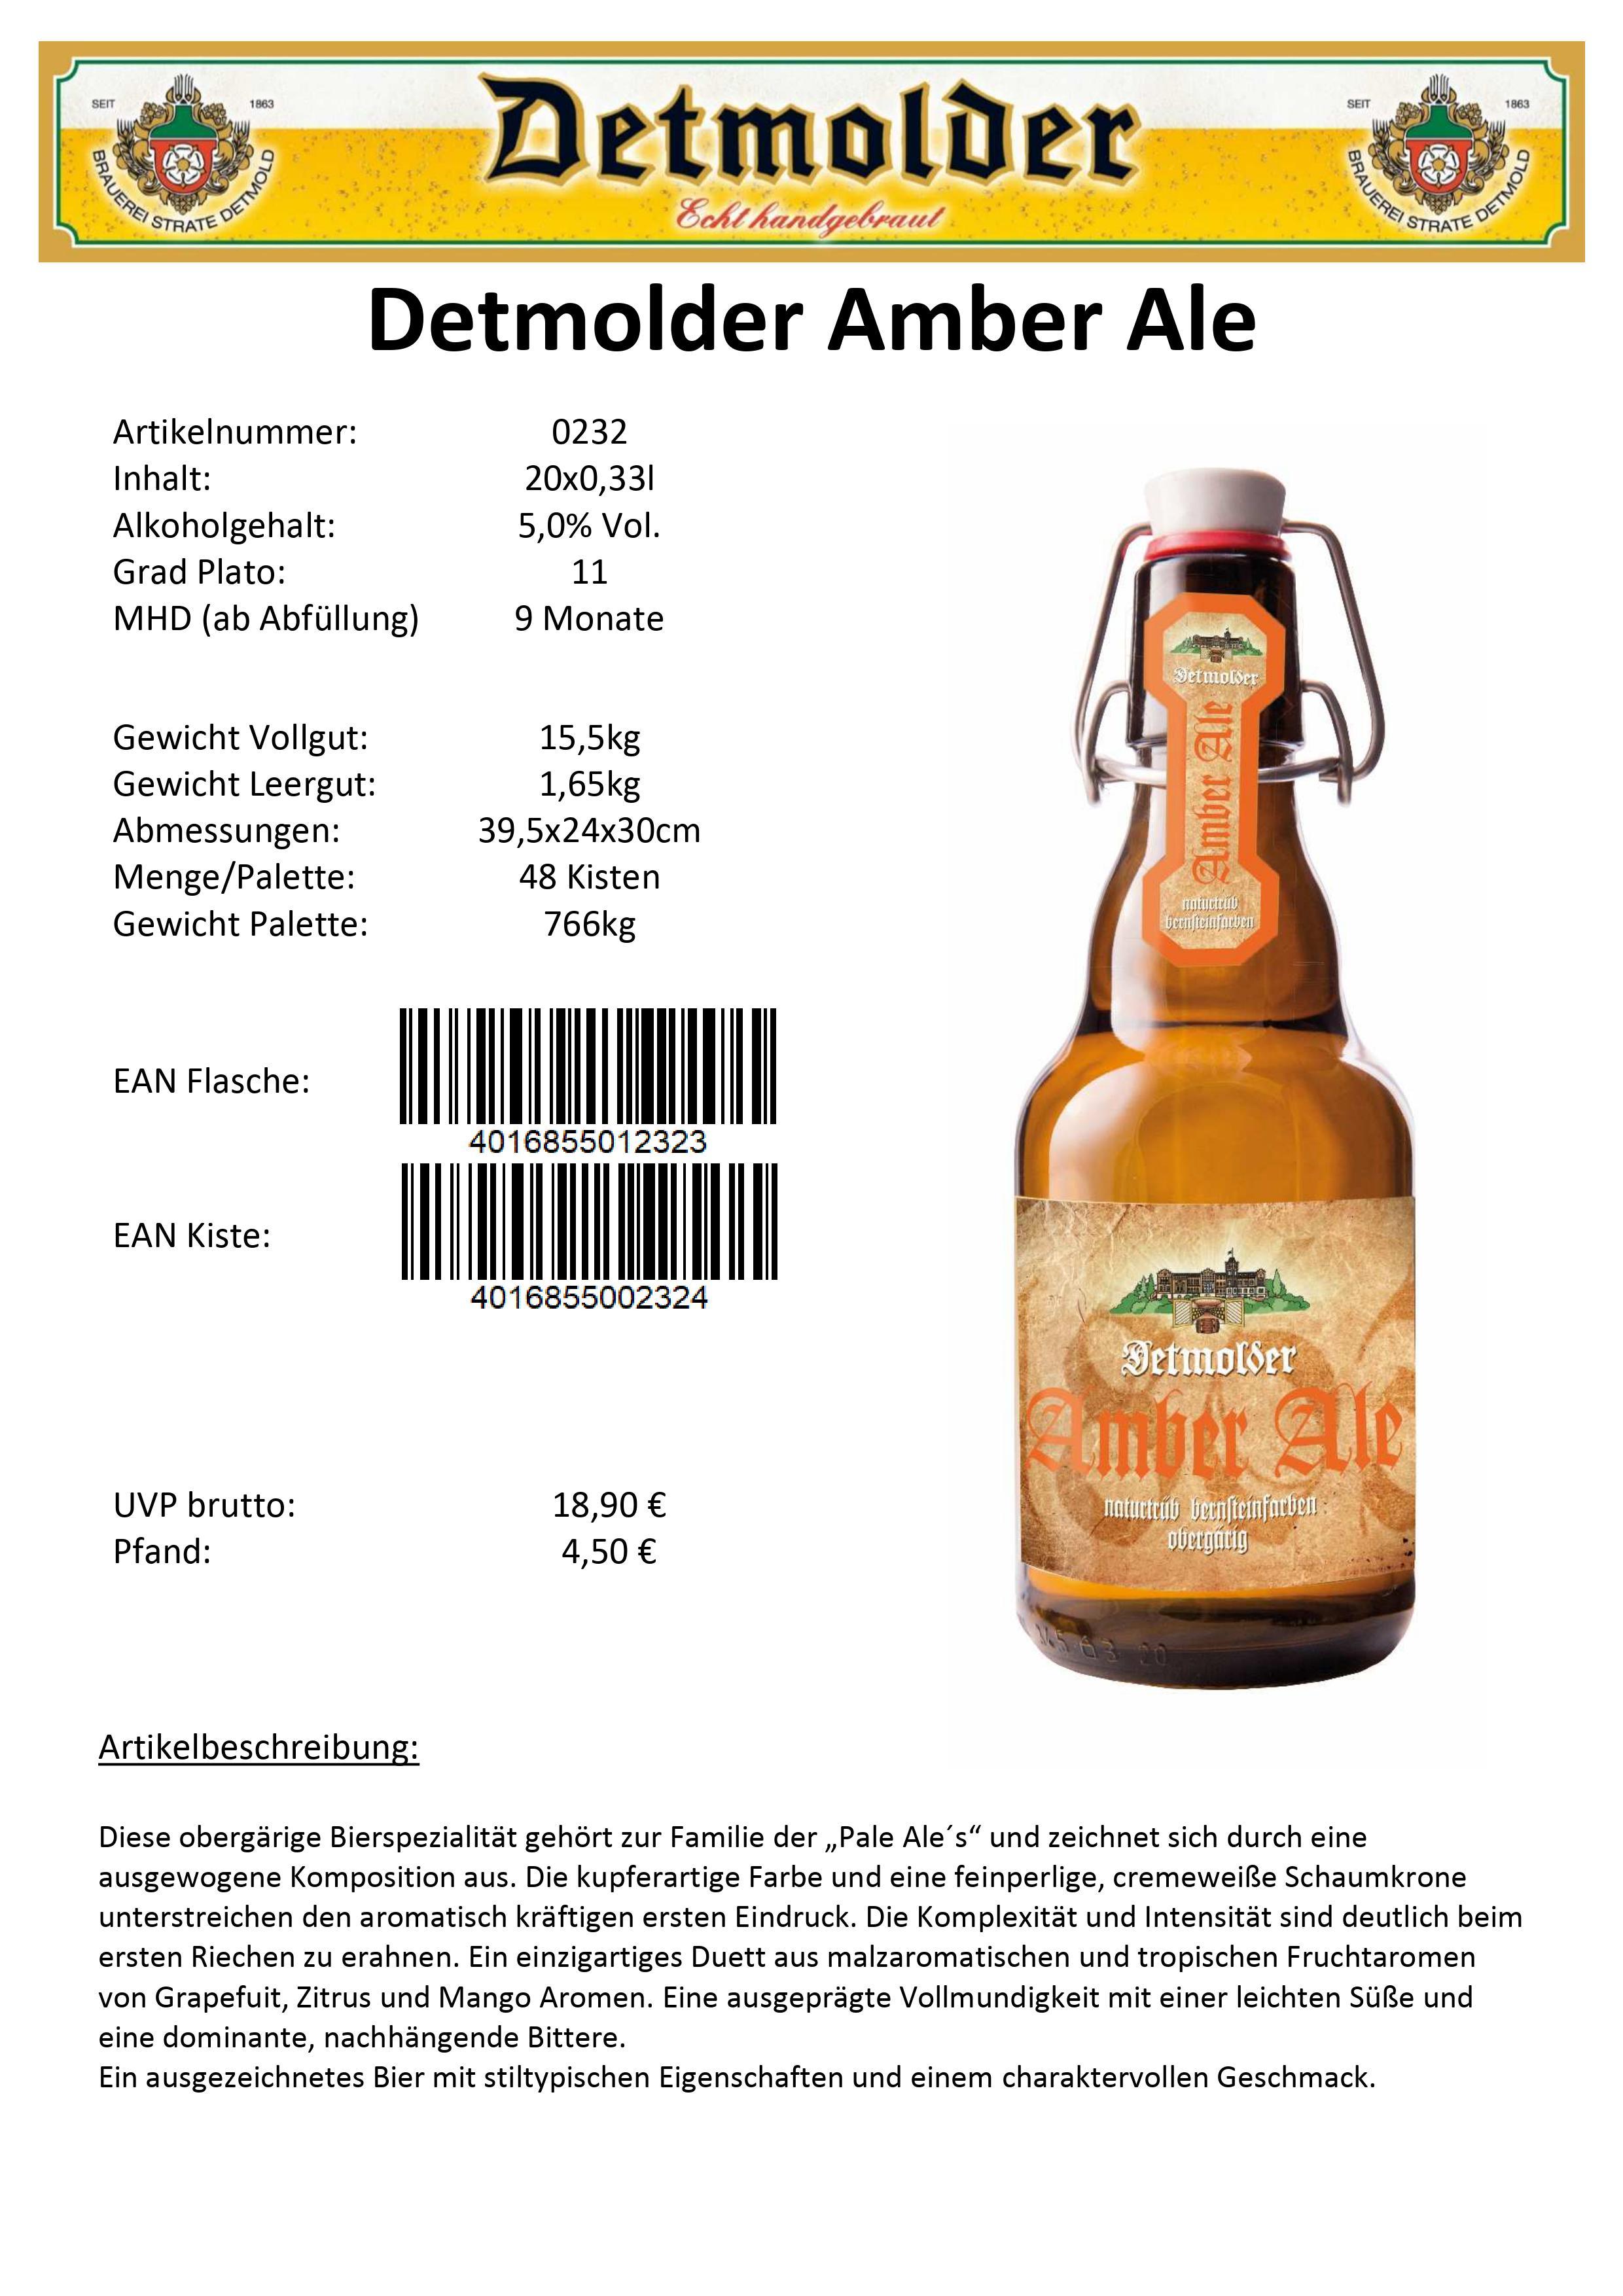 Artikelpass - Detmolder Amber Ale Image